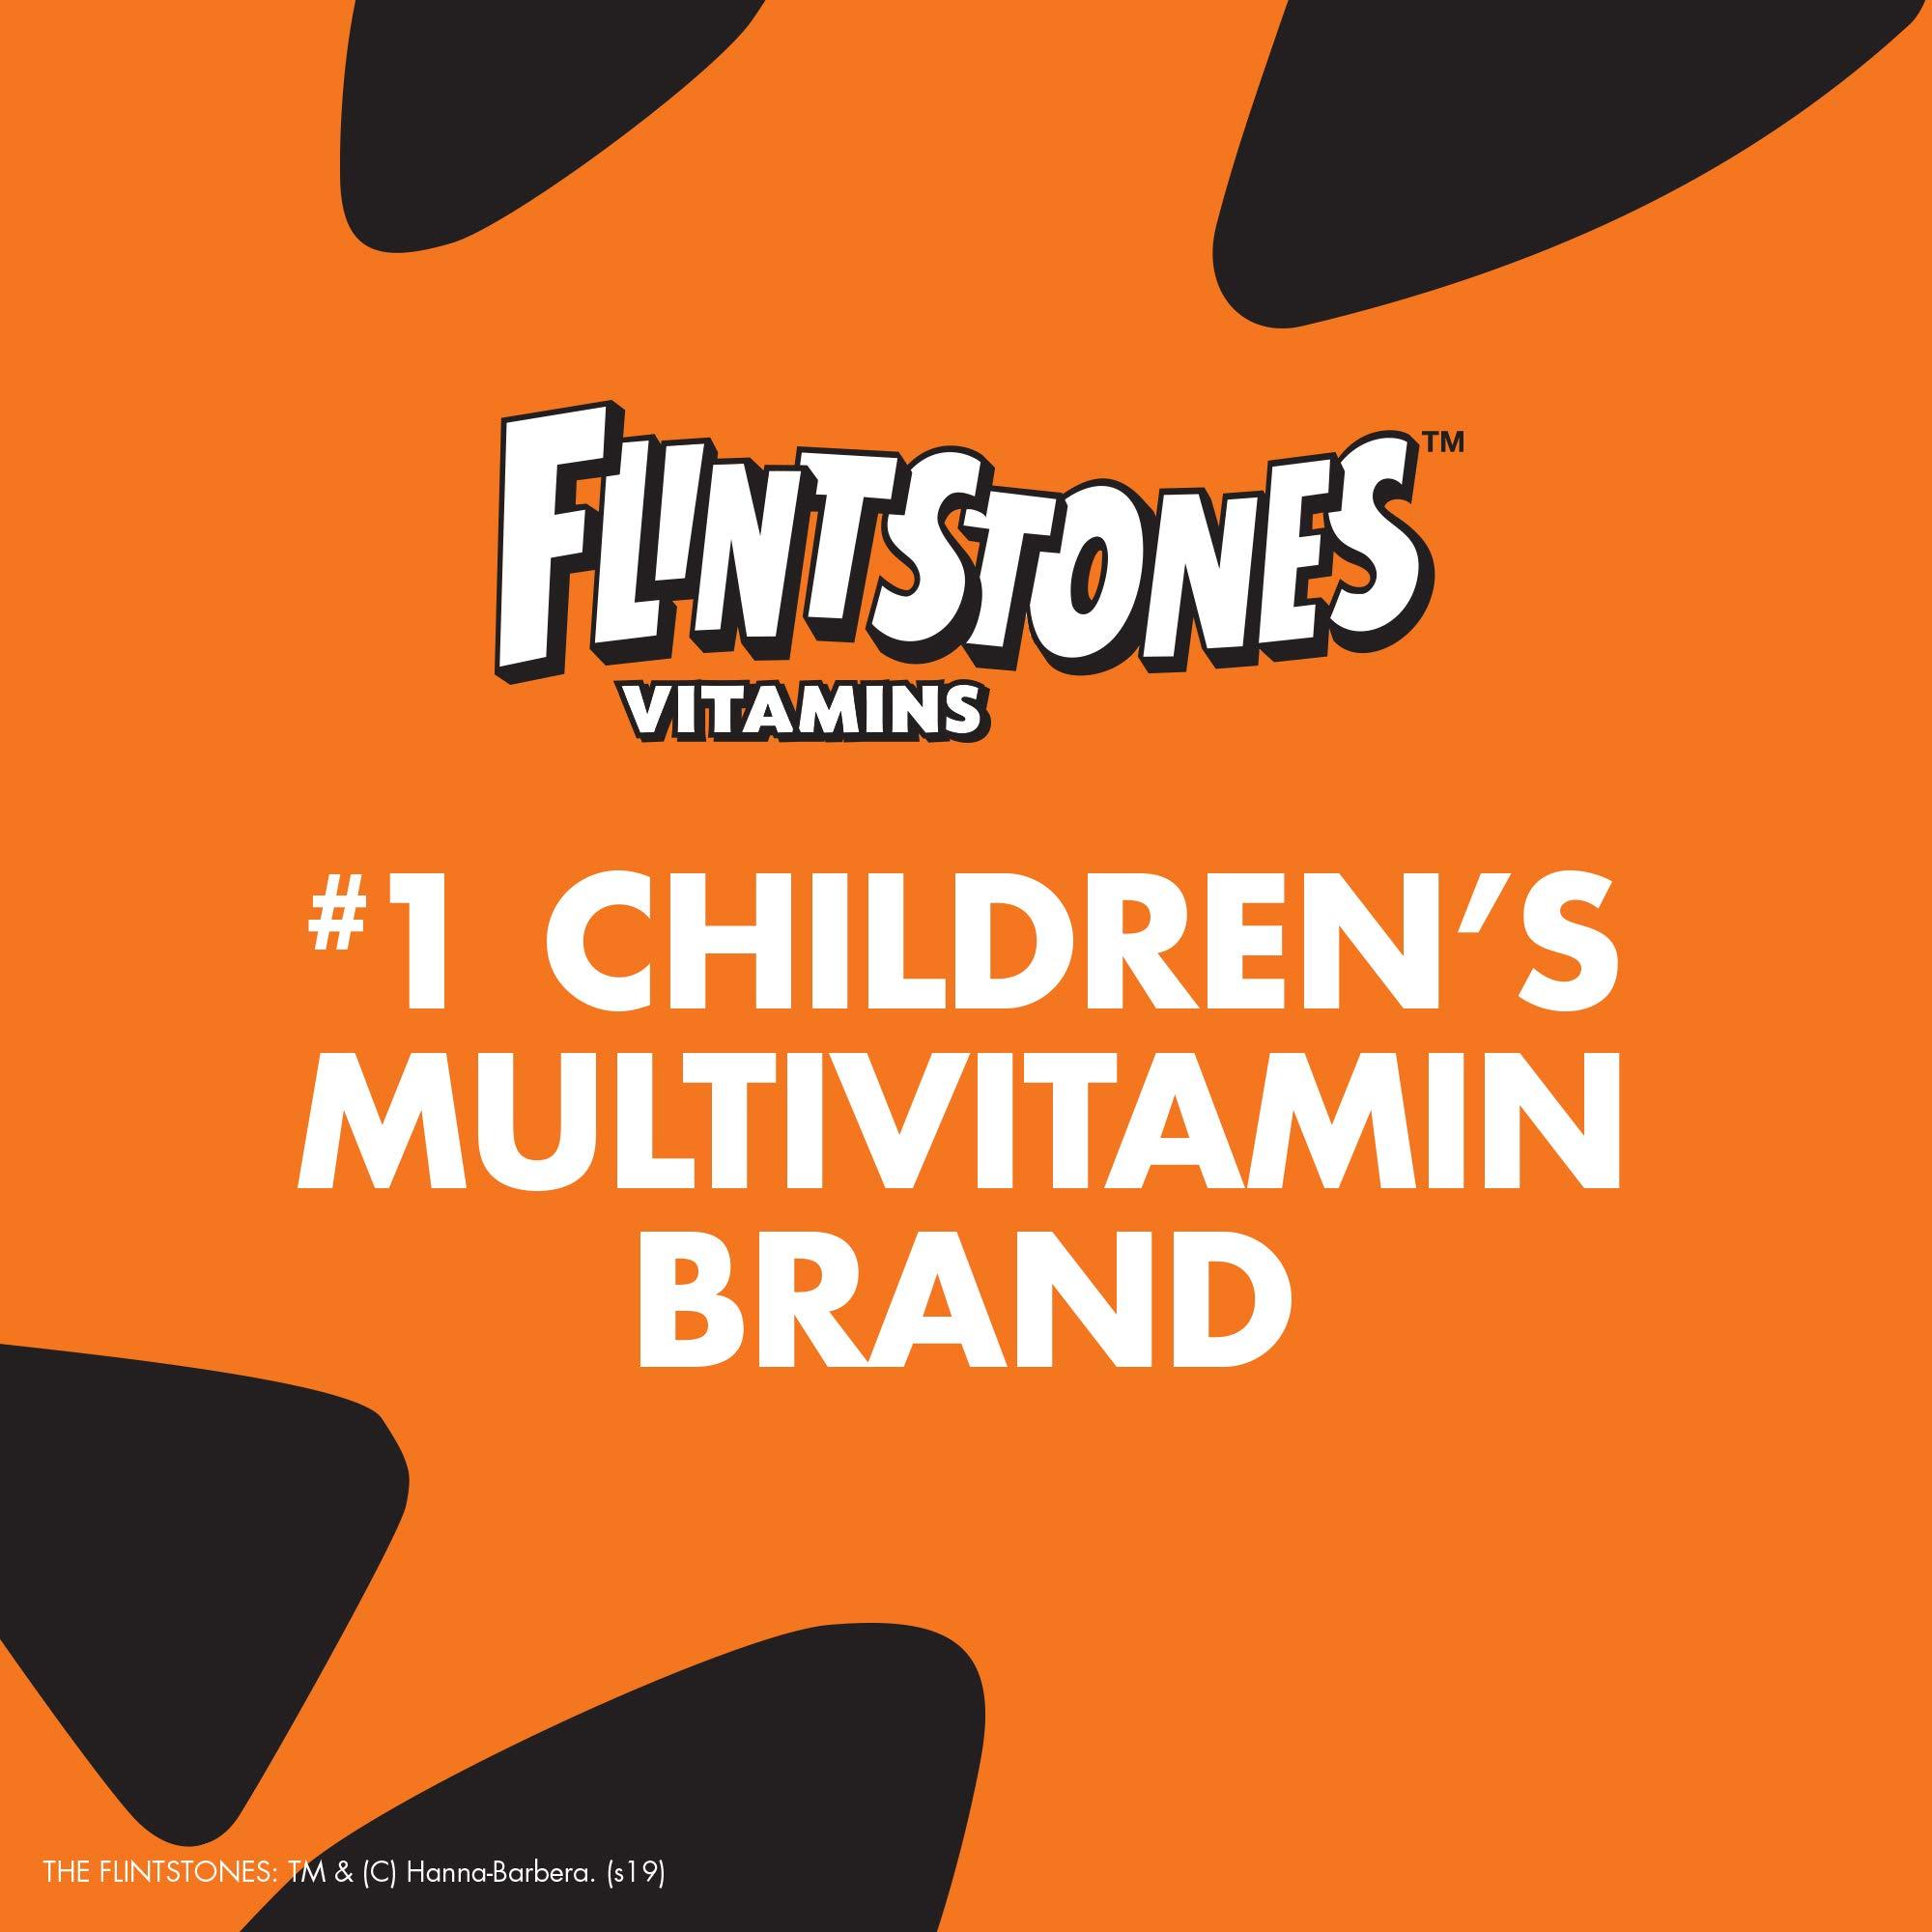 Flintstones Gummies Kids Vitamins with Immunity Support*, Kids and Toddler Multivitamin with Vitamin C, Vitamin D, B12, Zinc & more, 150ct